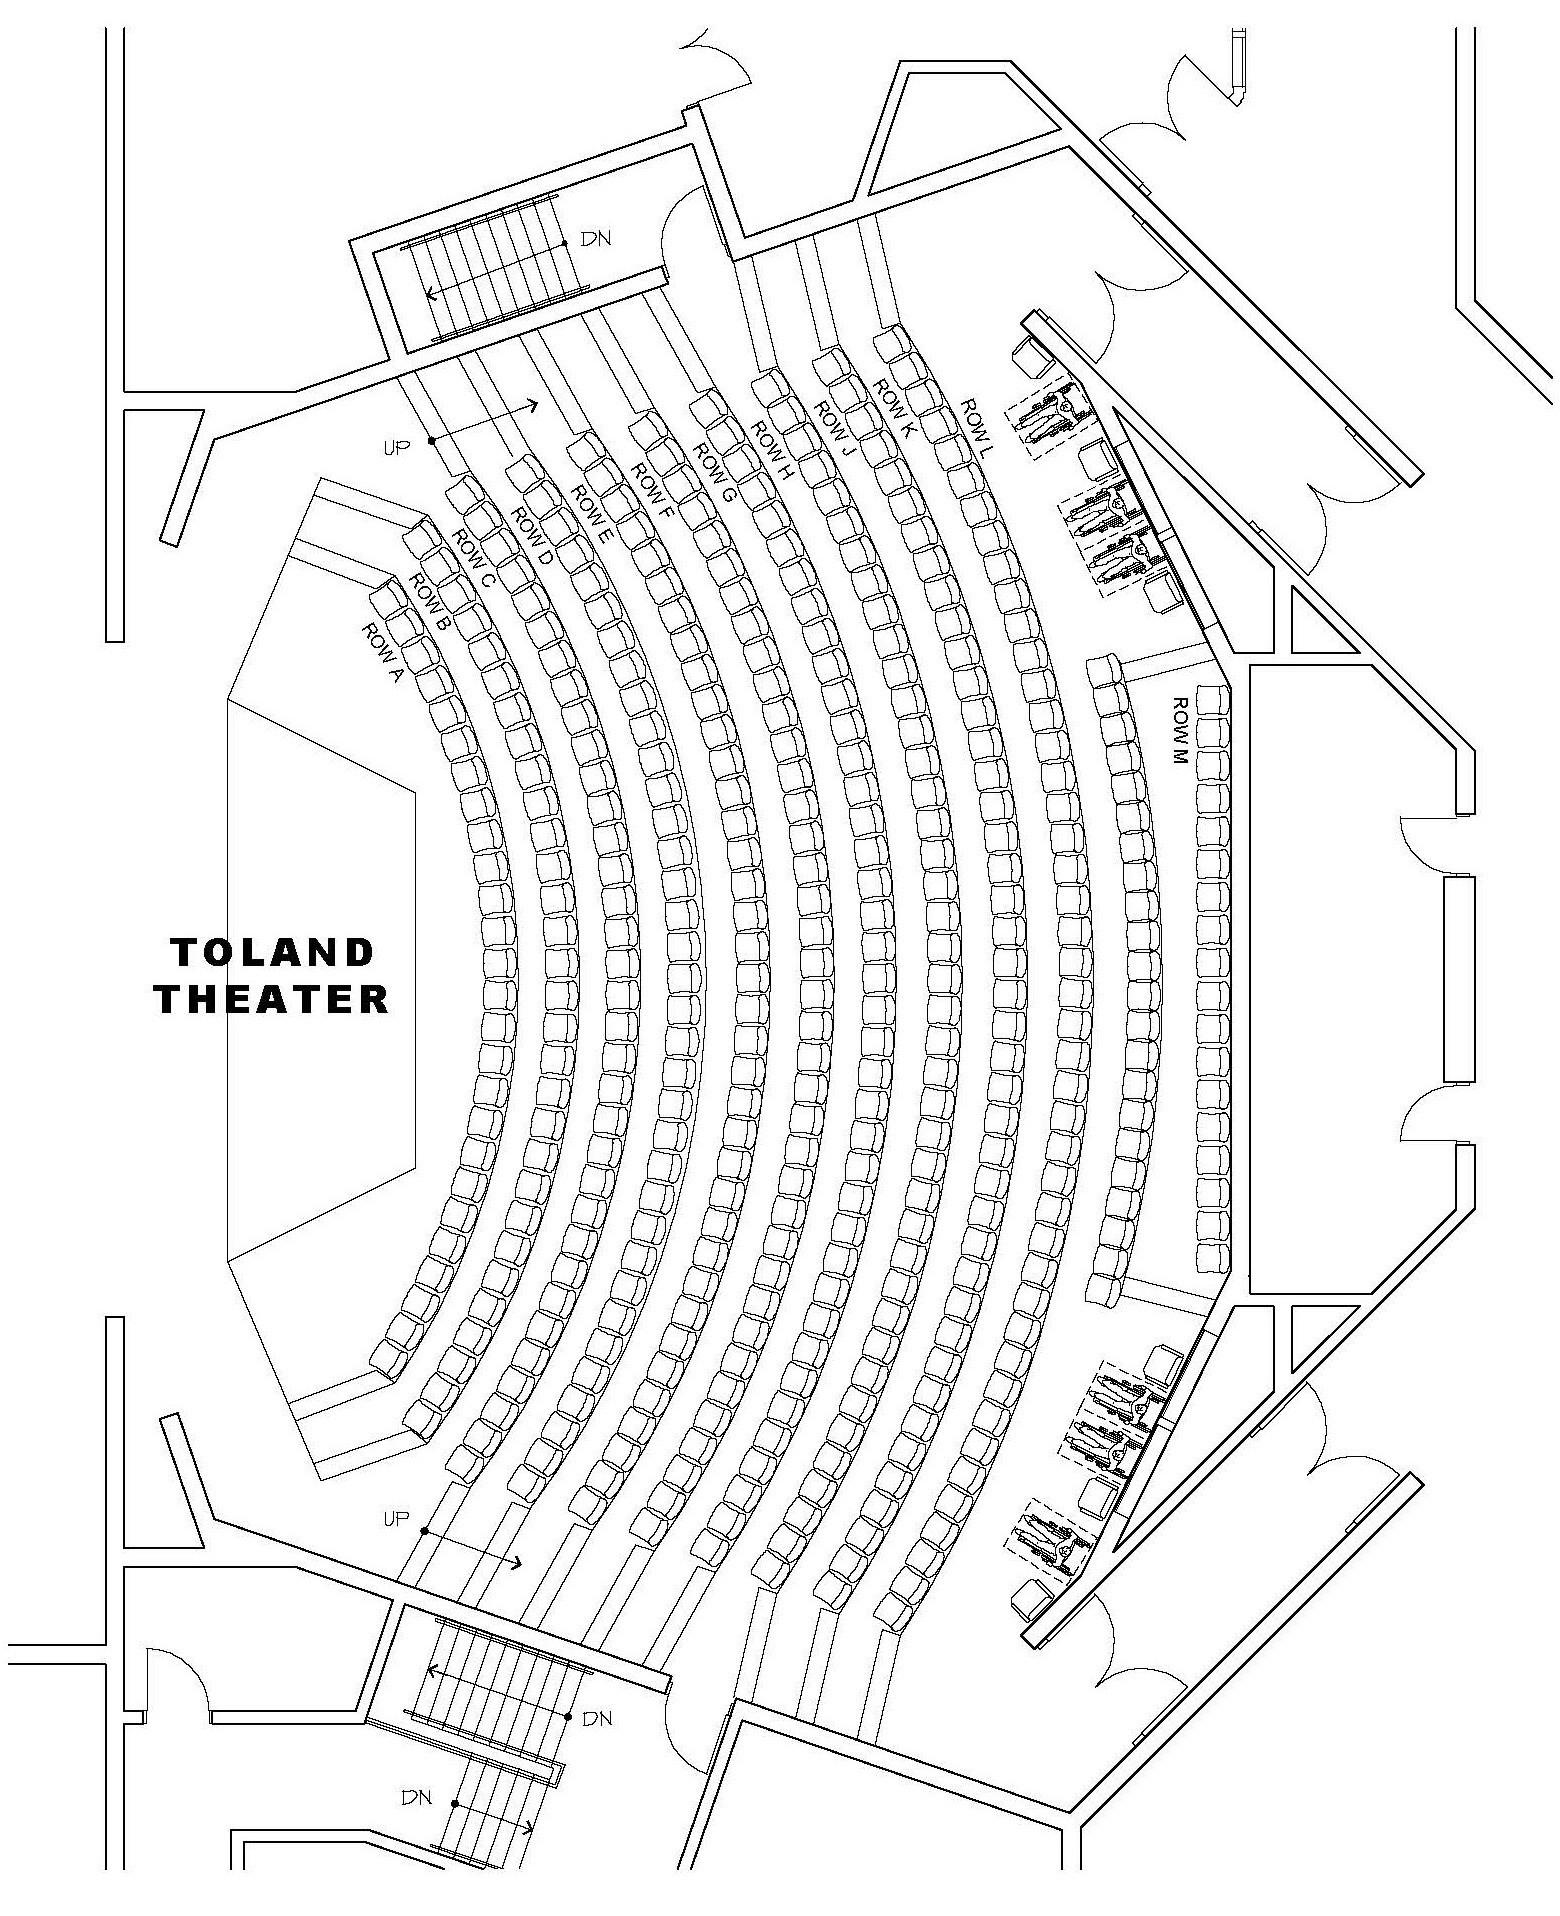 Seating Charts Theatre Arts